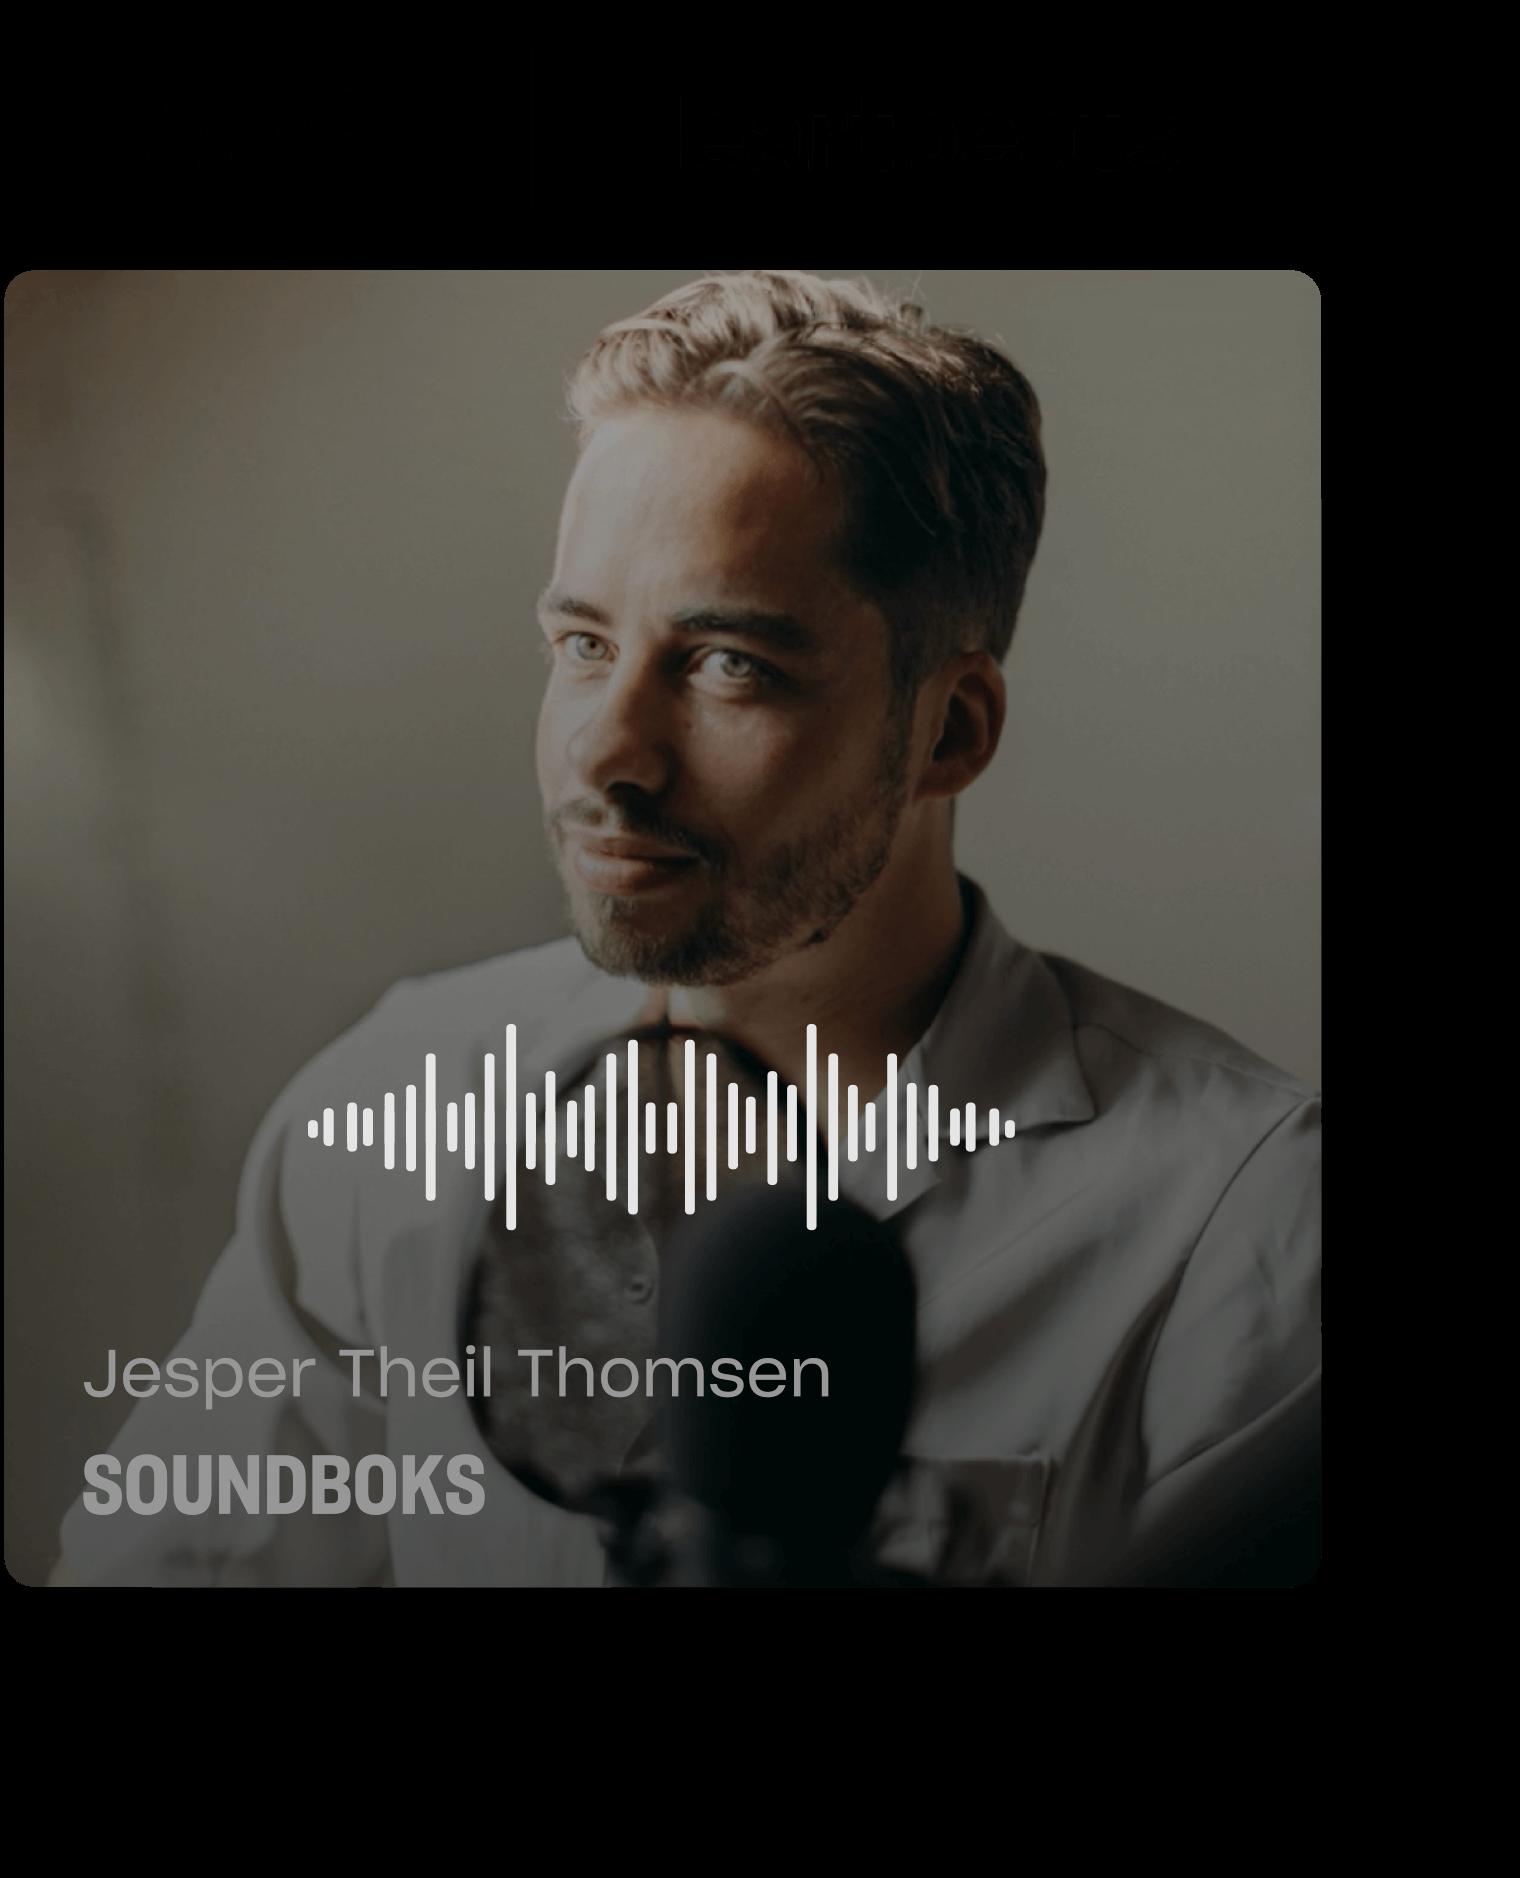 Podcast med Jesper Theil Thomsen, Soundboks.